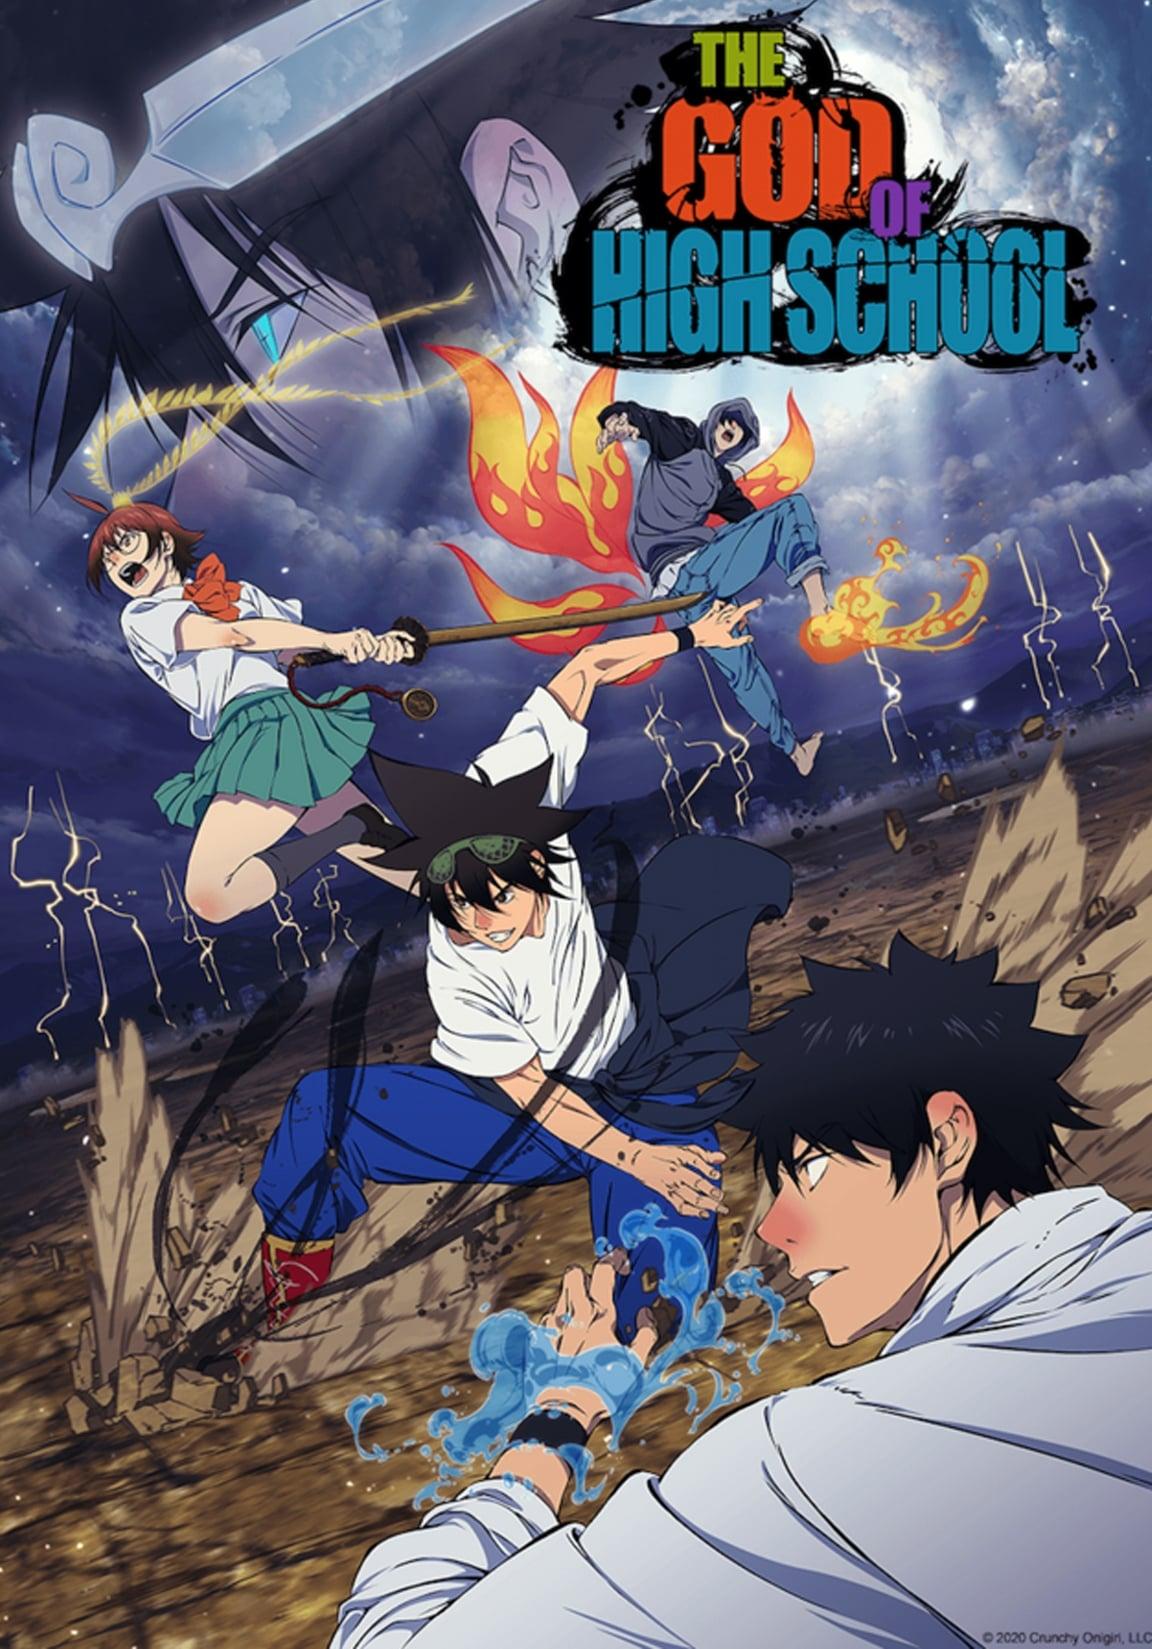 Nonton anime The God of High School Sub Indo